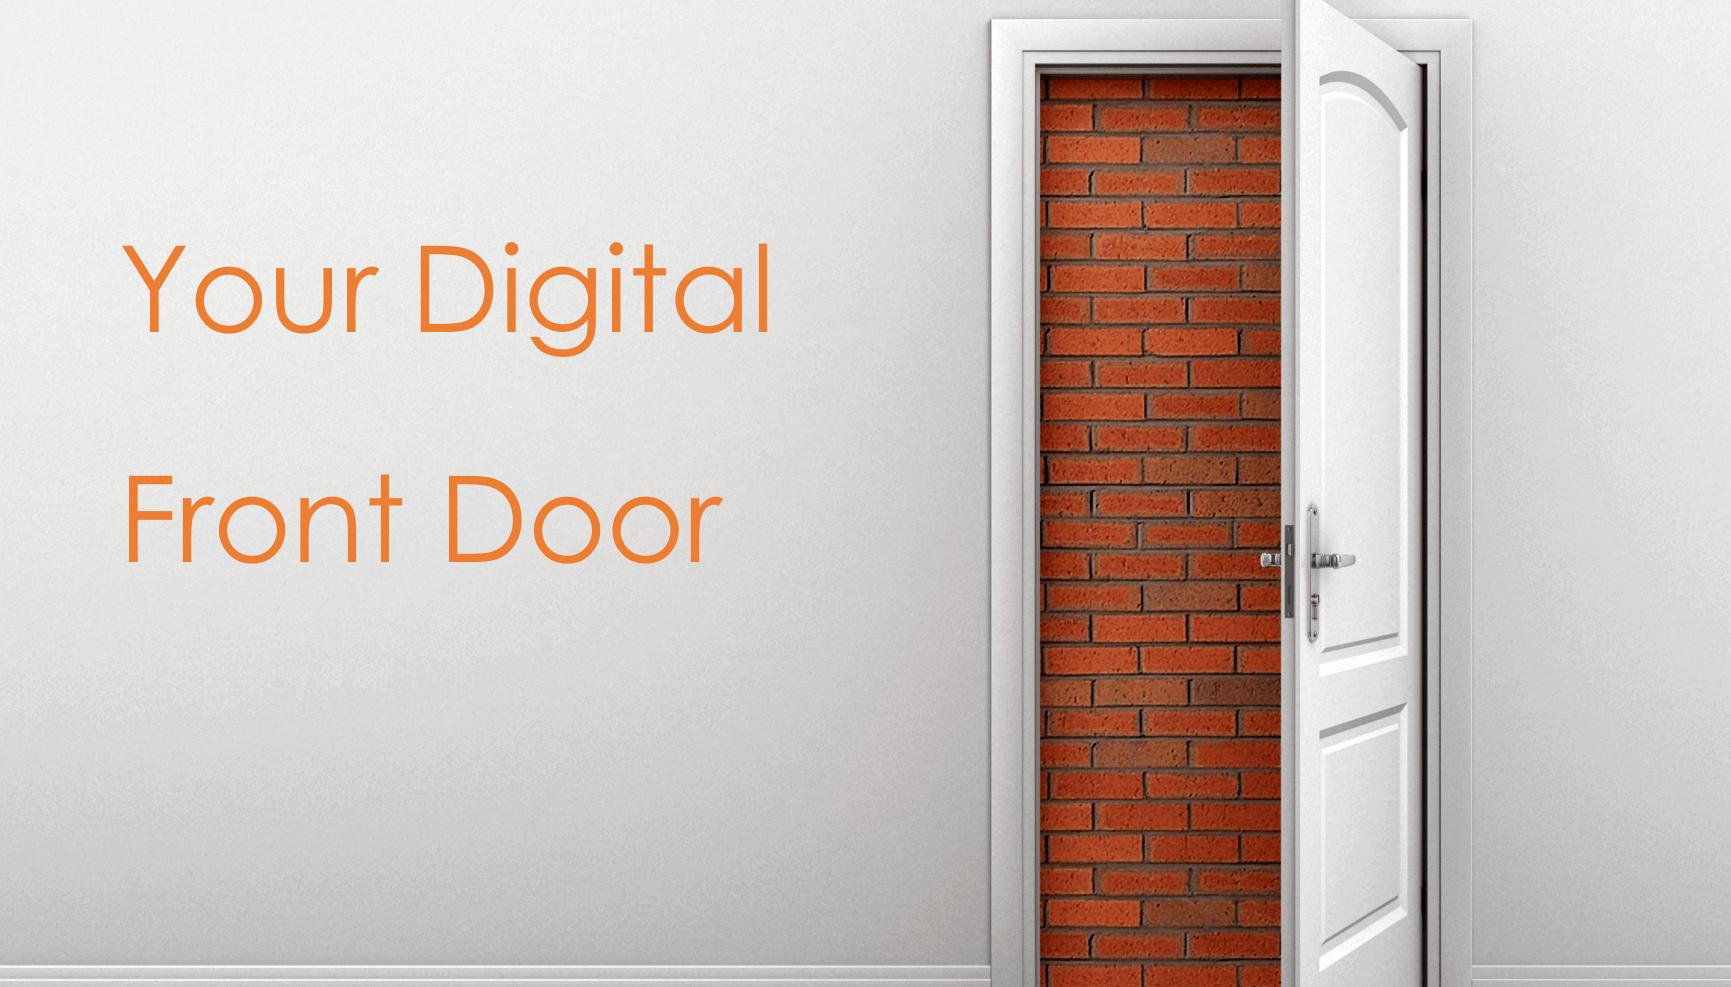 Front door opens to a brick wall